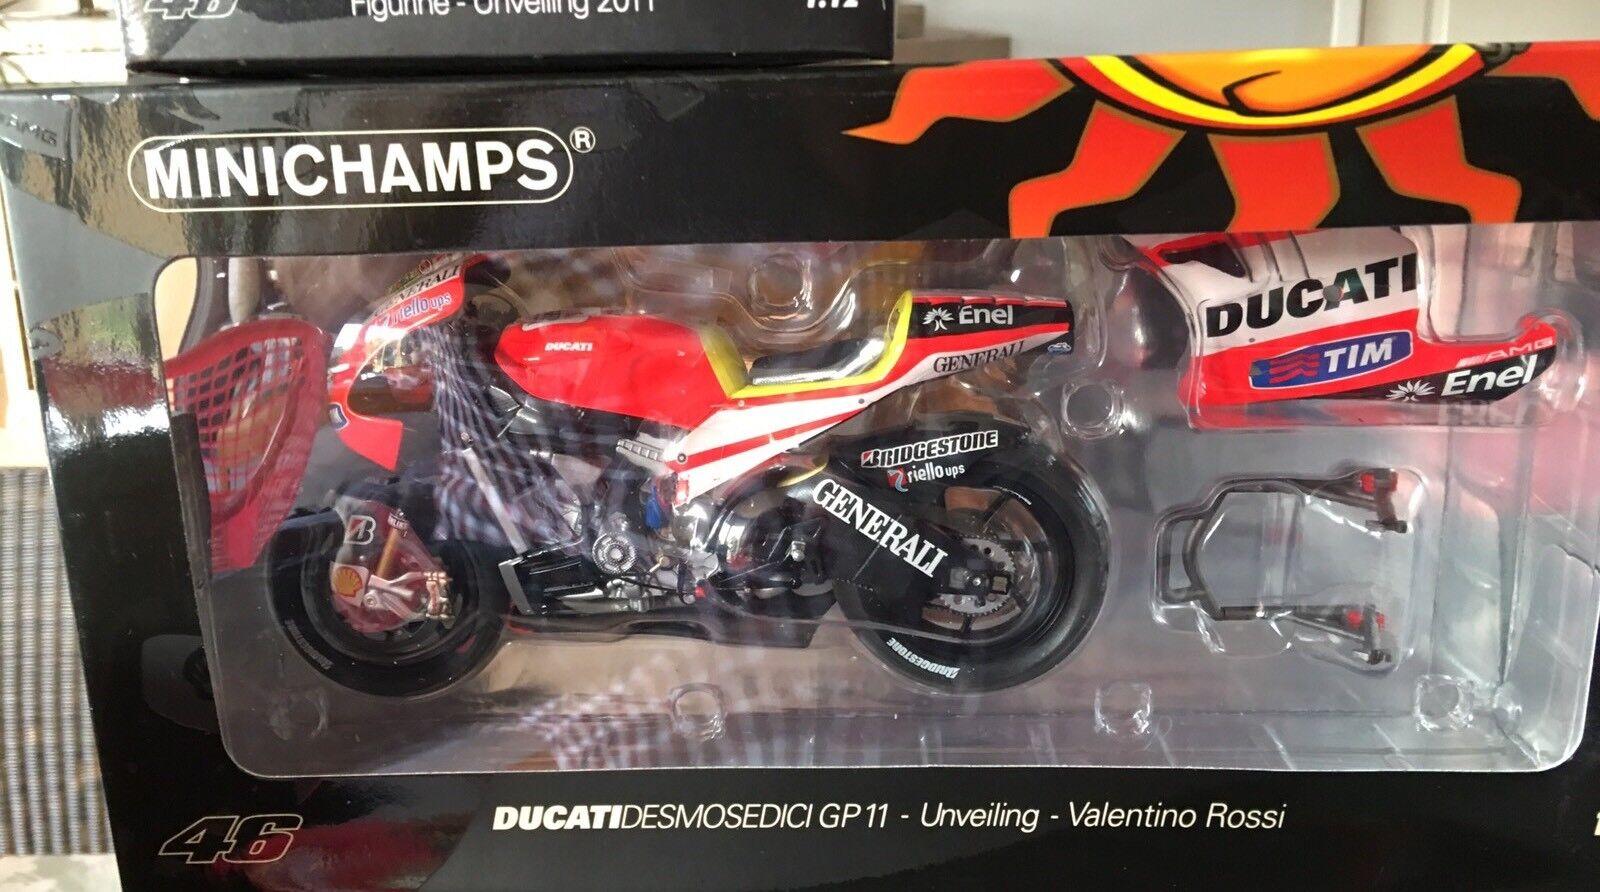 1 12 Minichamps Ducati  Desmosedici + Figure Rossi Unveiling 2011